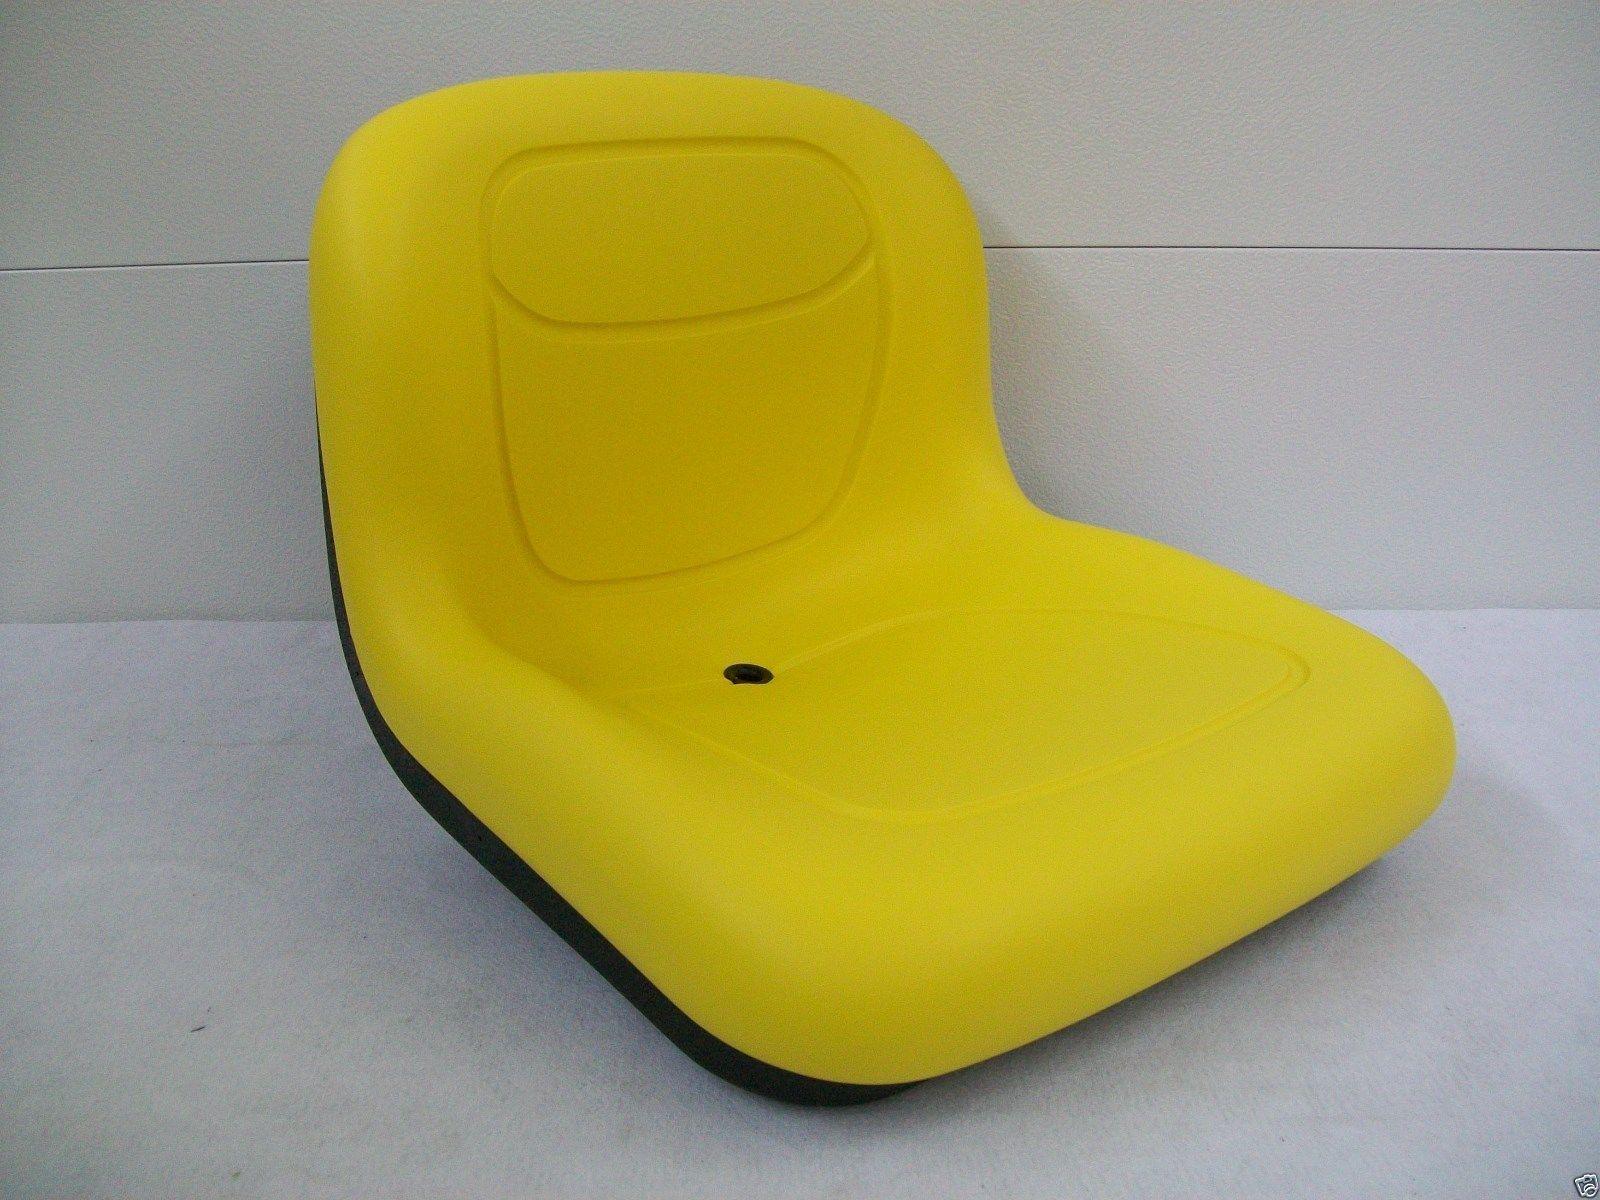 YELLOW SEAT JOHN DEERE 130, 160, 165, 316, 318, 322, 330, 332, 420, 430,  STX38 MOWERS #BA